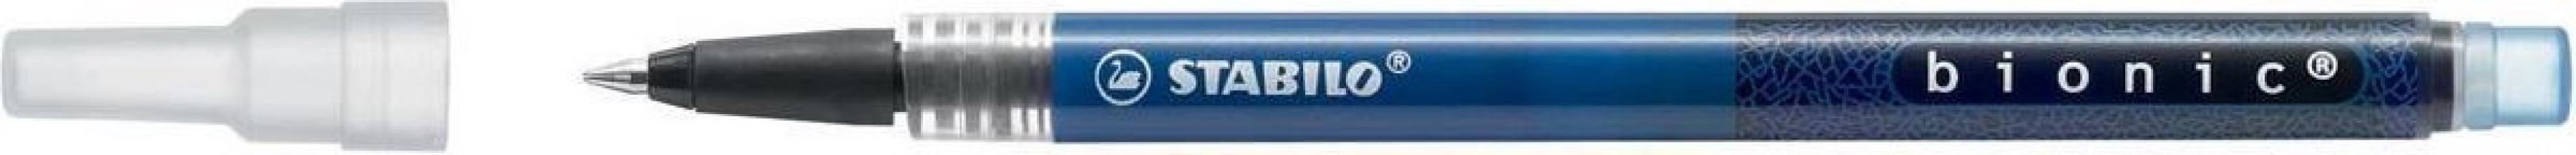 , Rollerpenvulling STABILO Bionic blauw